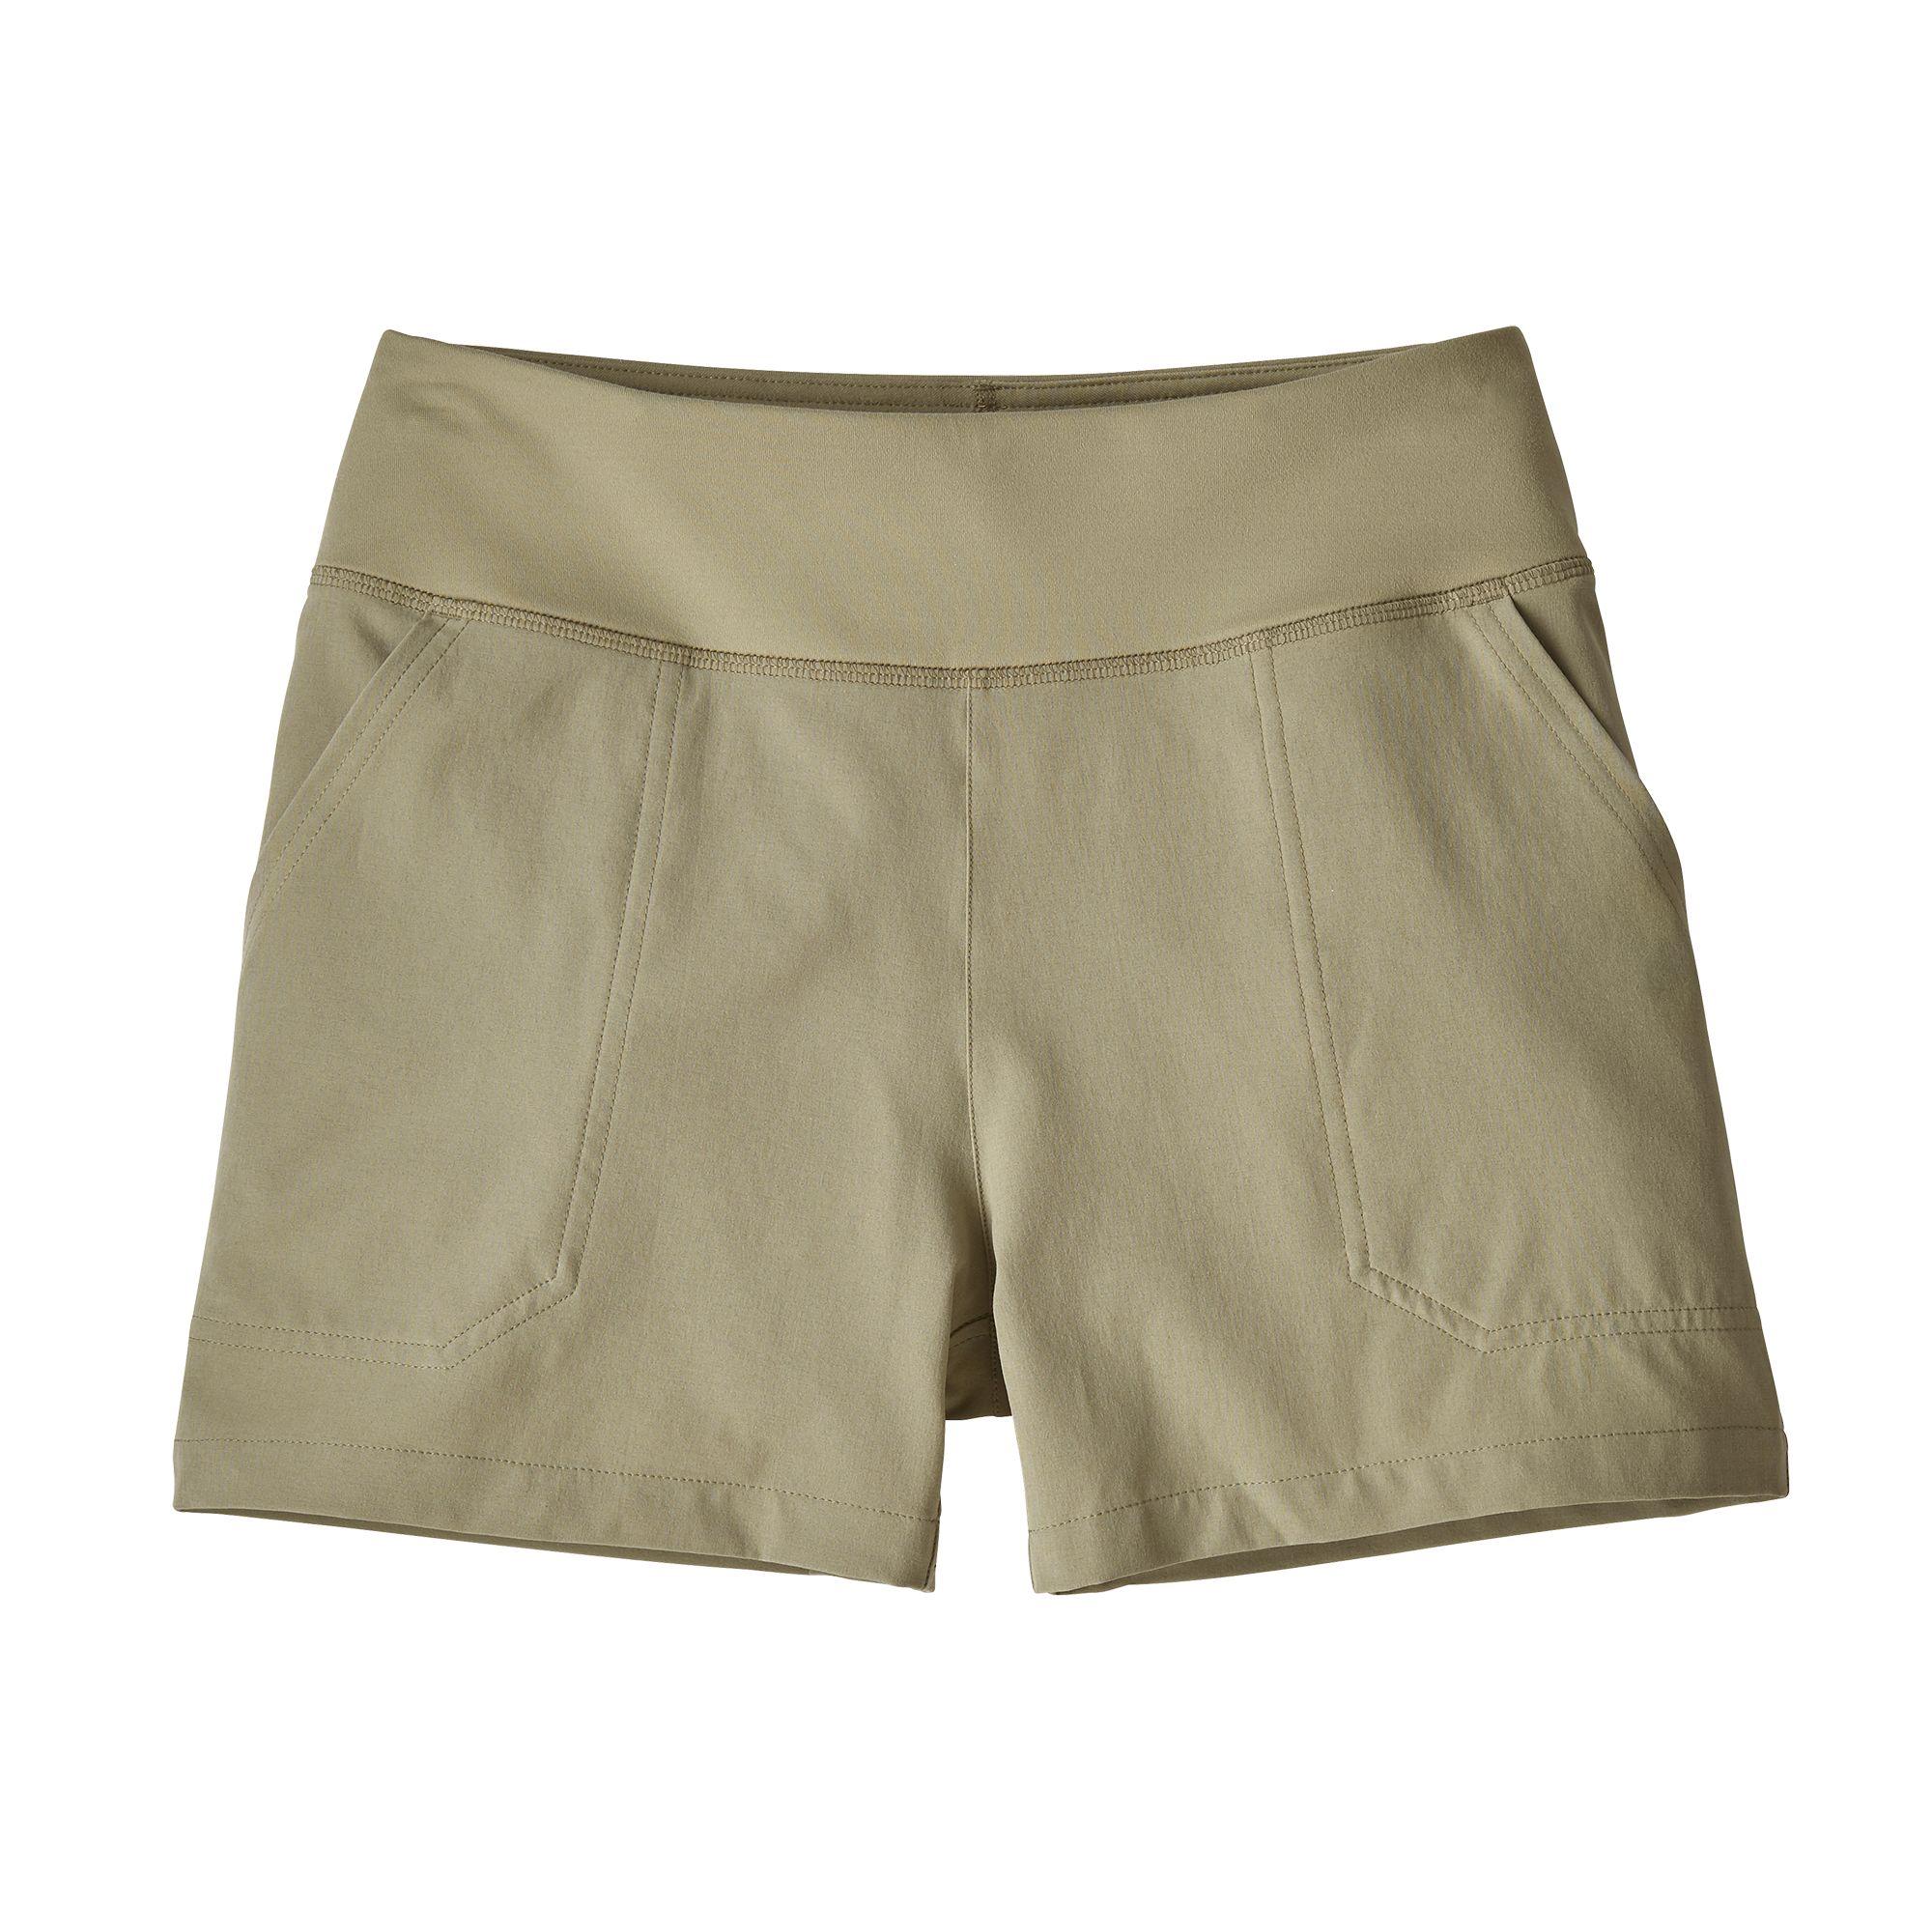 Patagonia W's Happy Hike Shorts - 4